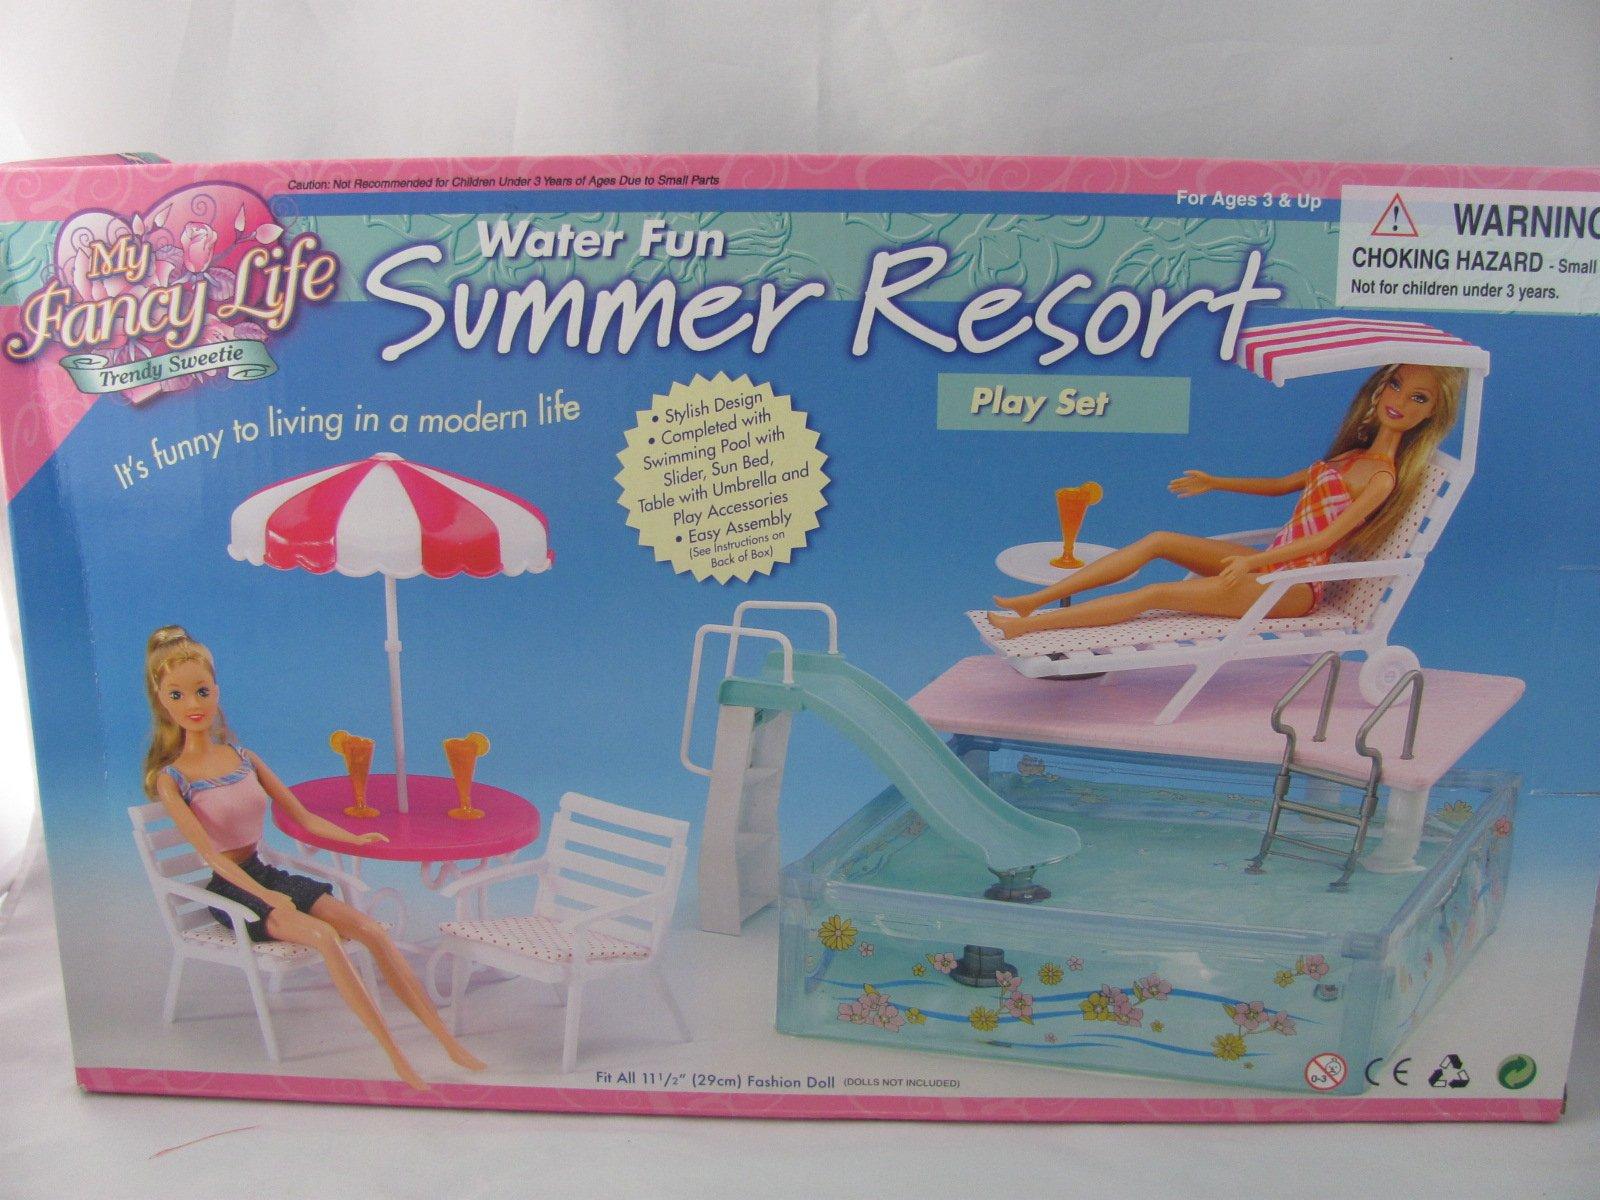 Barbie Size Dollhouse Furniture - Summer Resort Water Fun